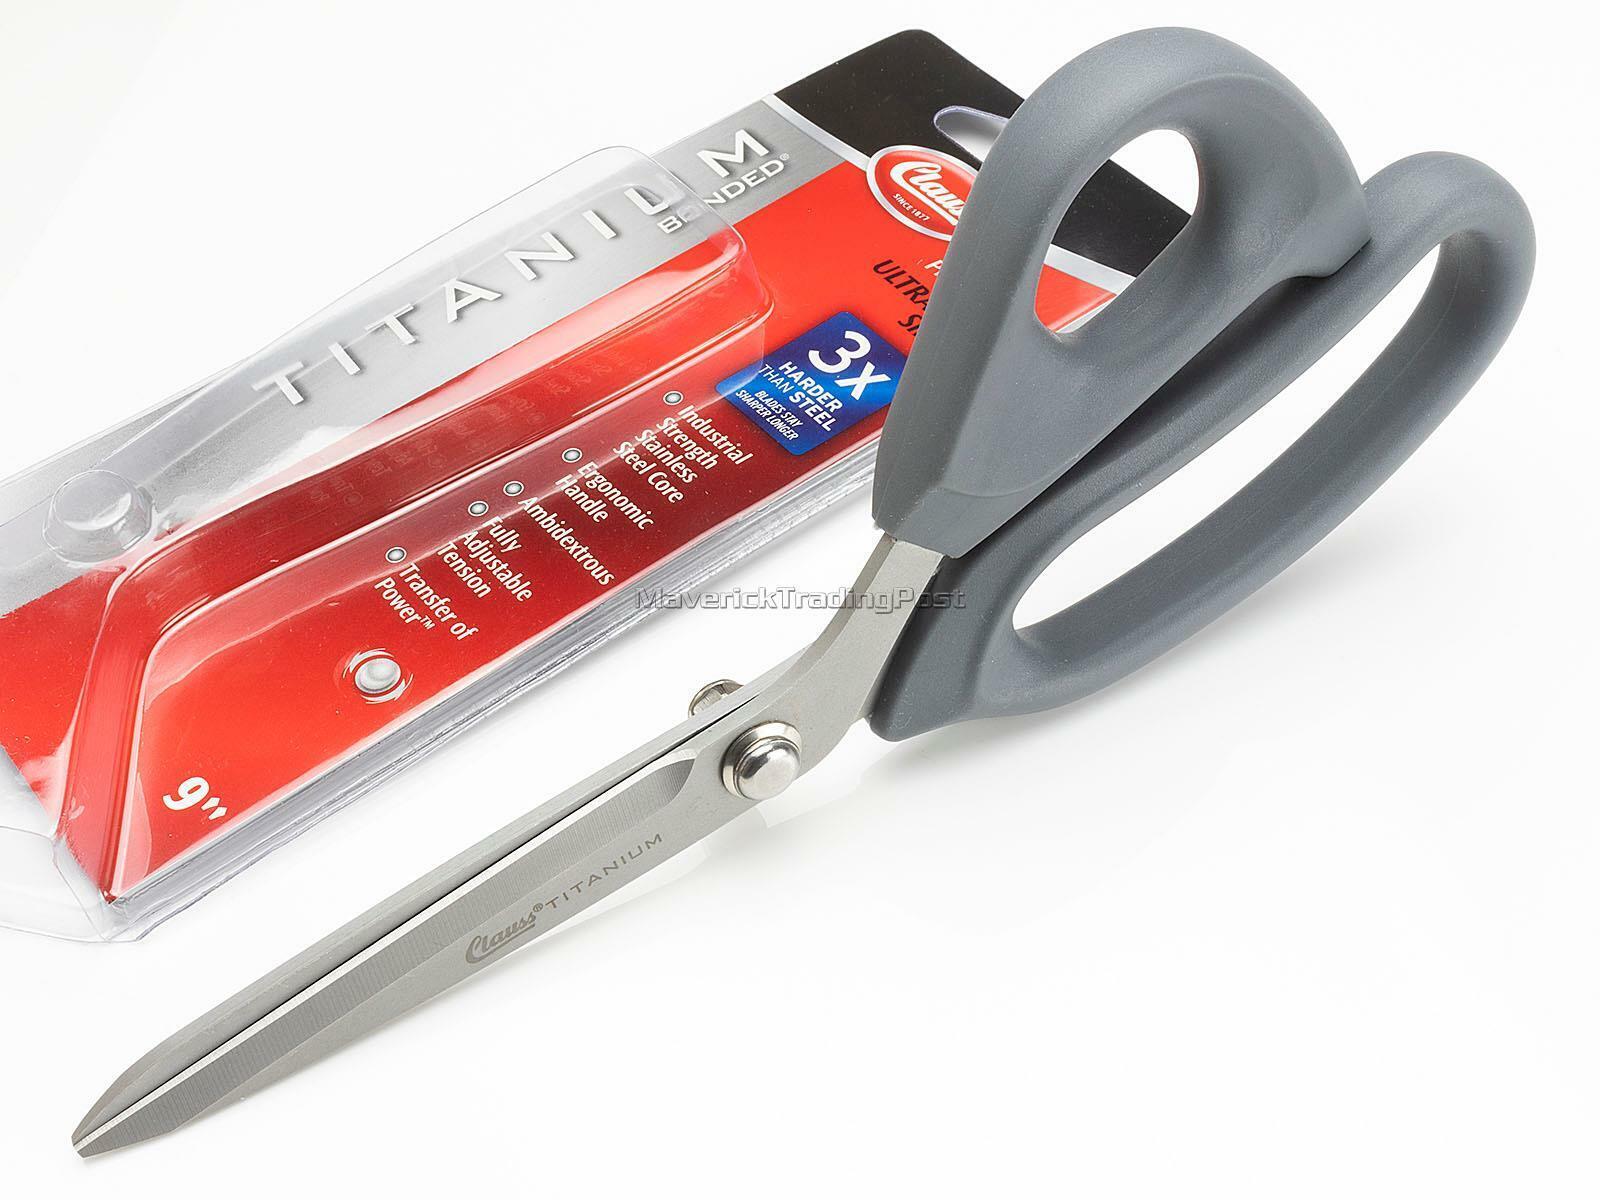 Clauss 18080 9-Inch Titanium Bonded Ultra Flex Bent Shear Grey 9 inch